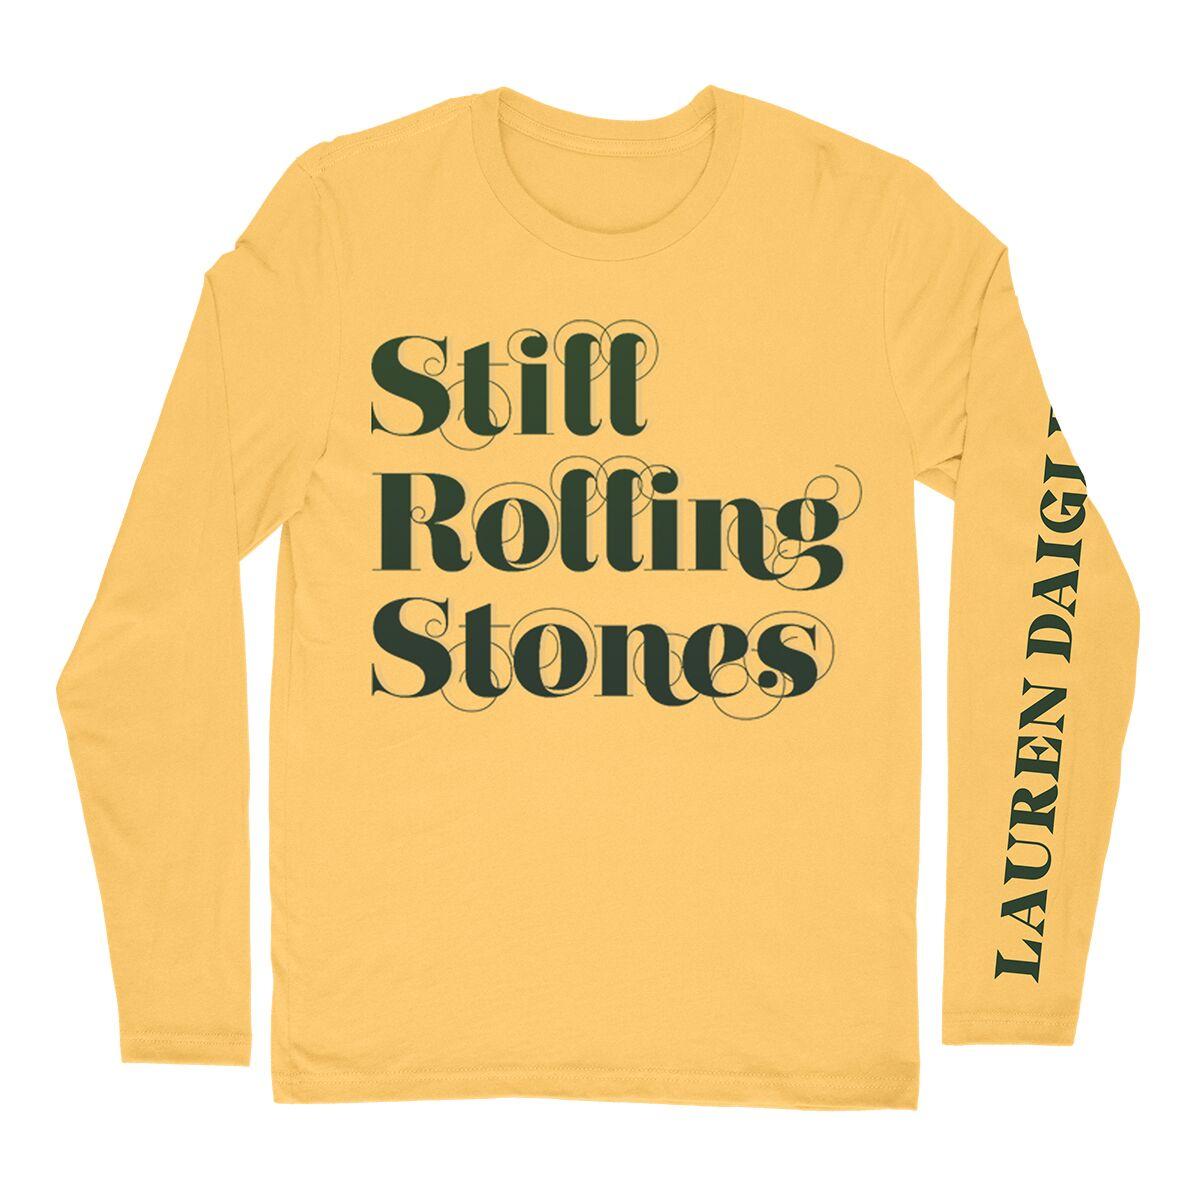 Still Rolling Stones Longsleeve T-shirt